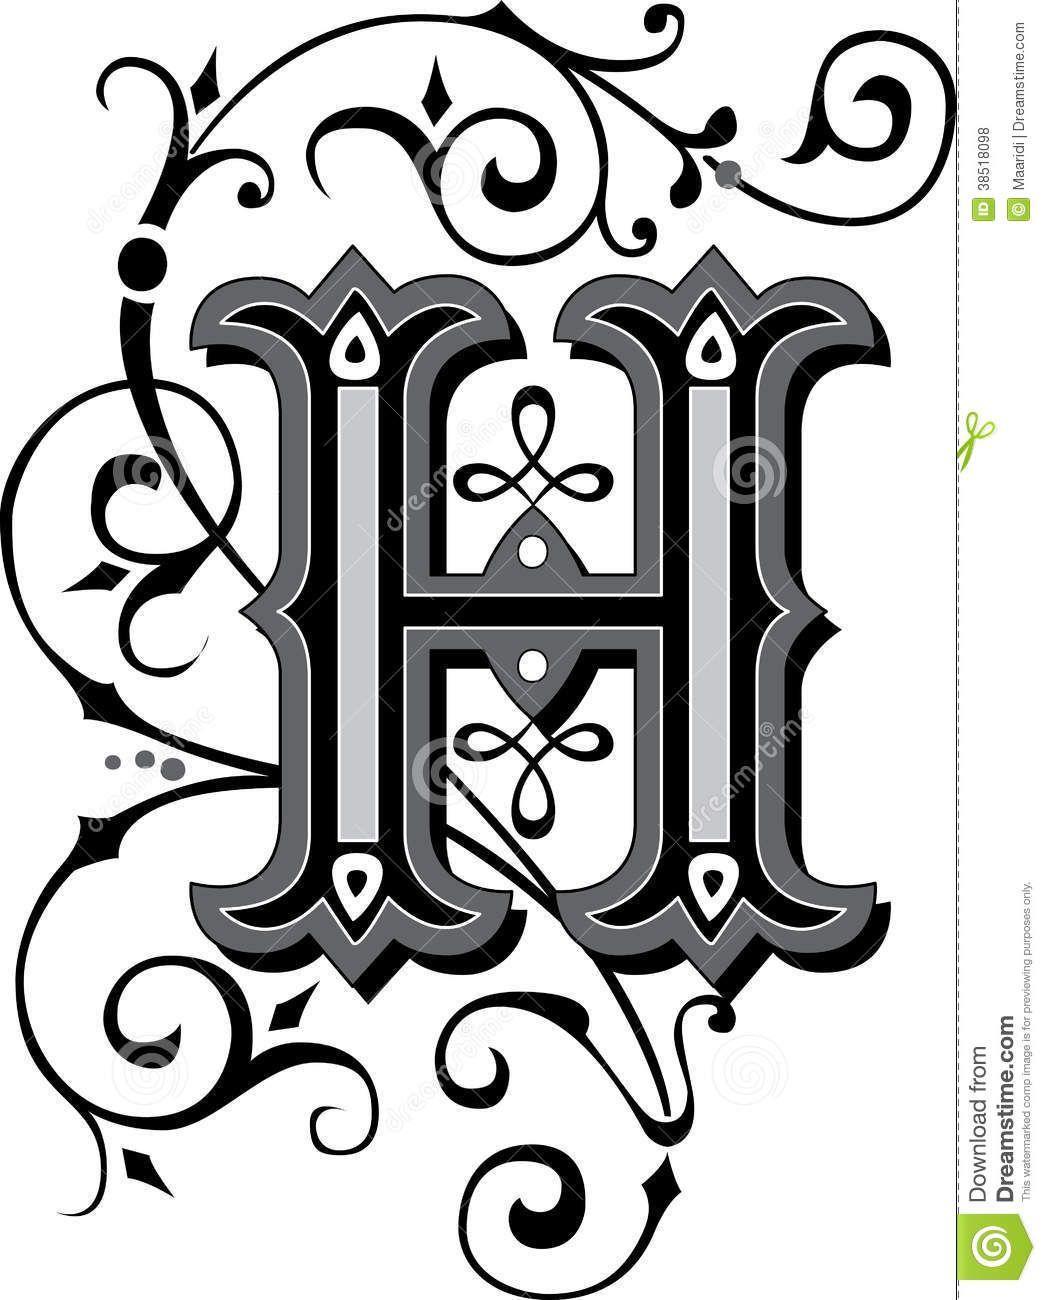 Alphabet Letter Designs Art: Pin By Veronica Hernandez On Digital Art